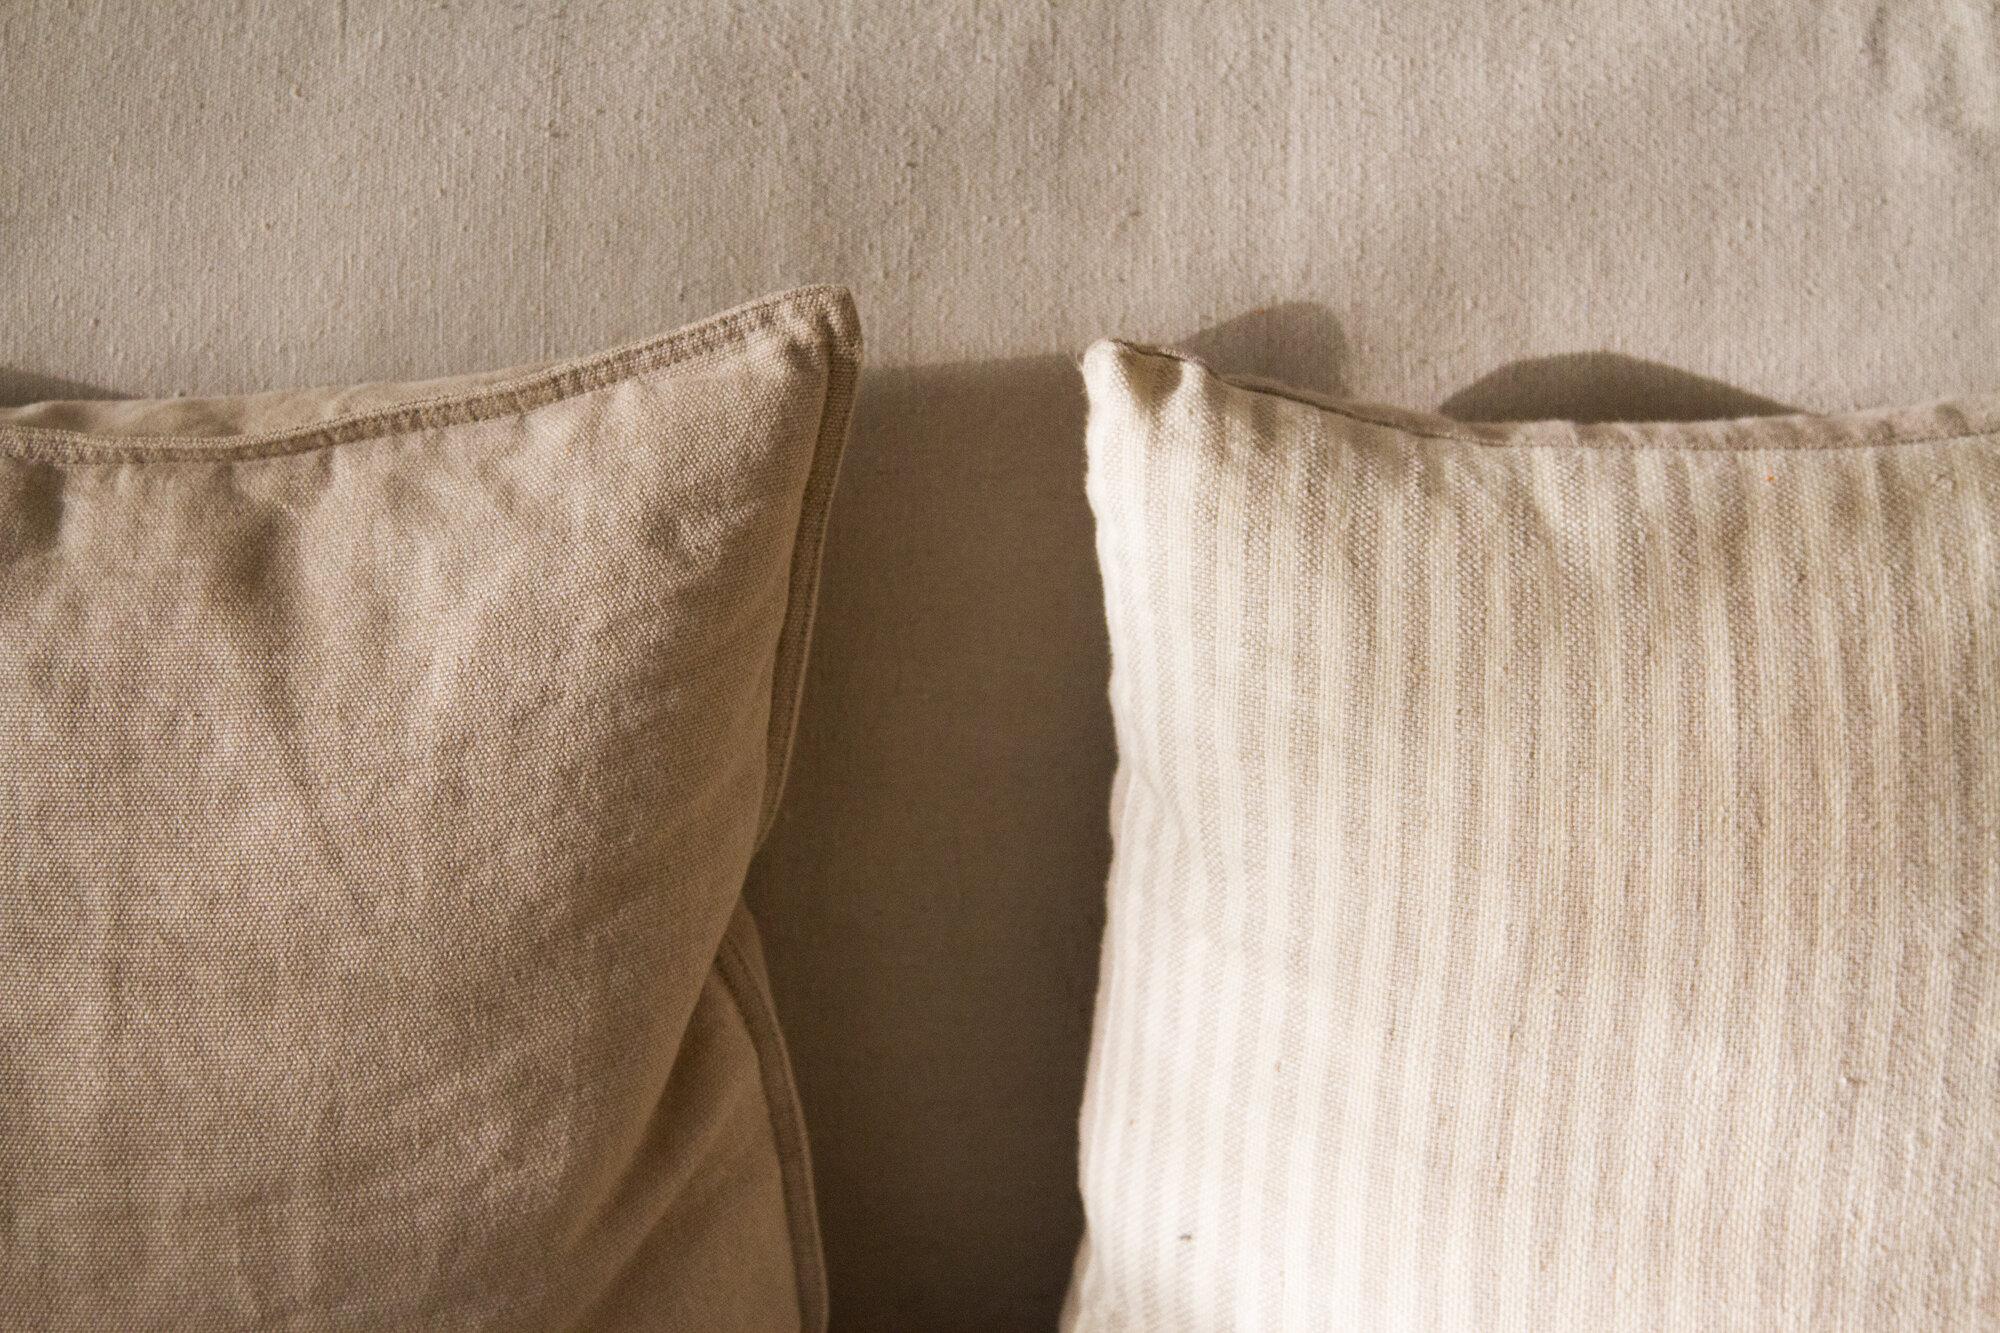 throw pillows | reading my tea leaves